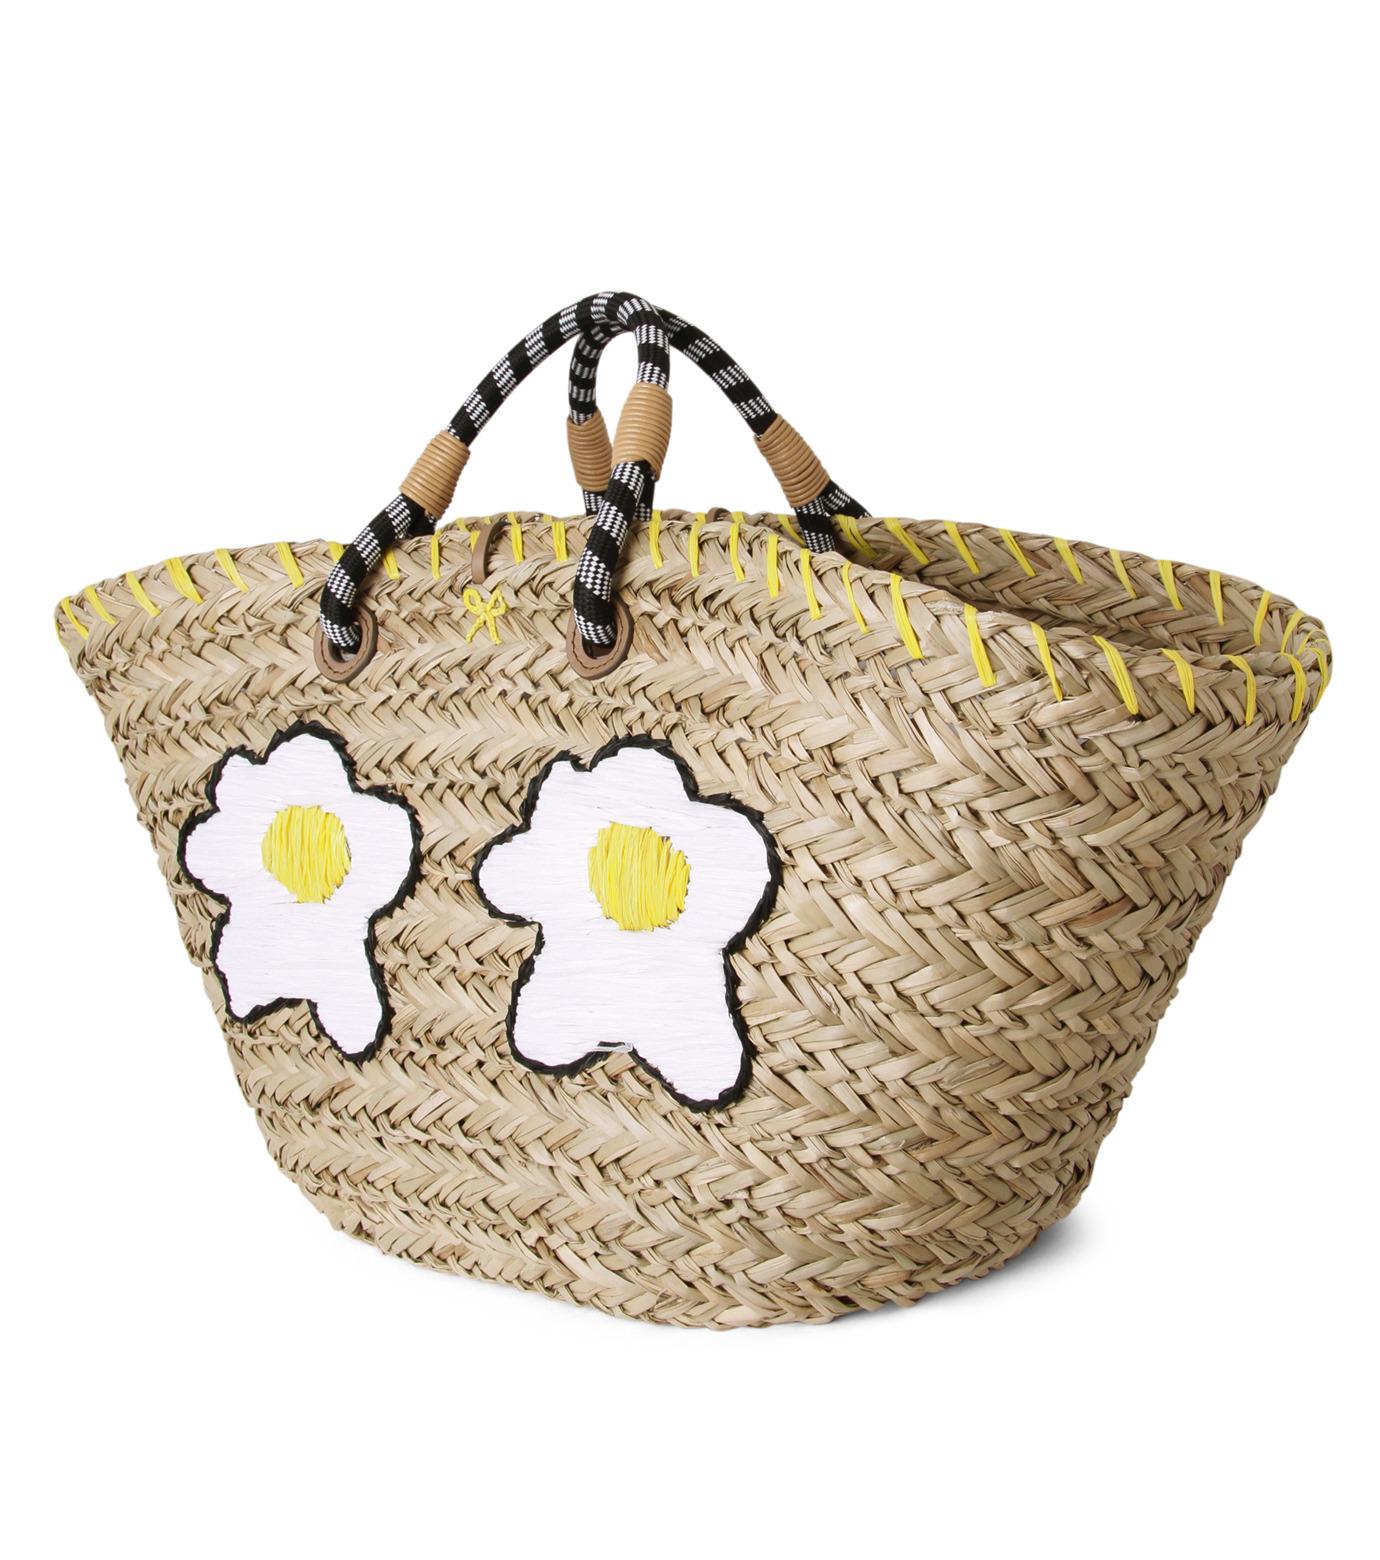 Anya Hindmarch(アニヤハインドマーチ)のBasket Fried Eggs-BEIGE-925884235-52 拡大詳細画像2